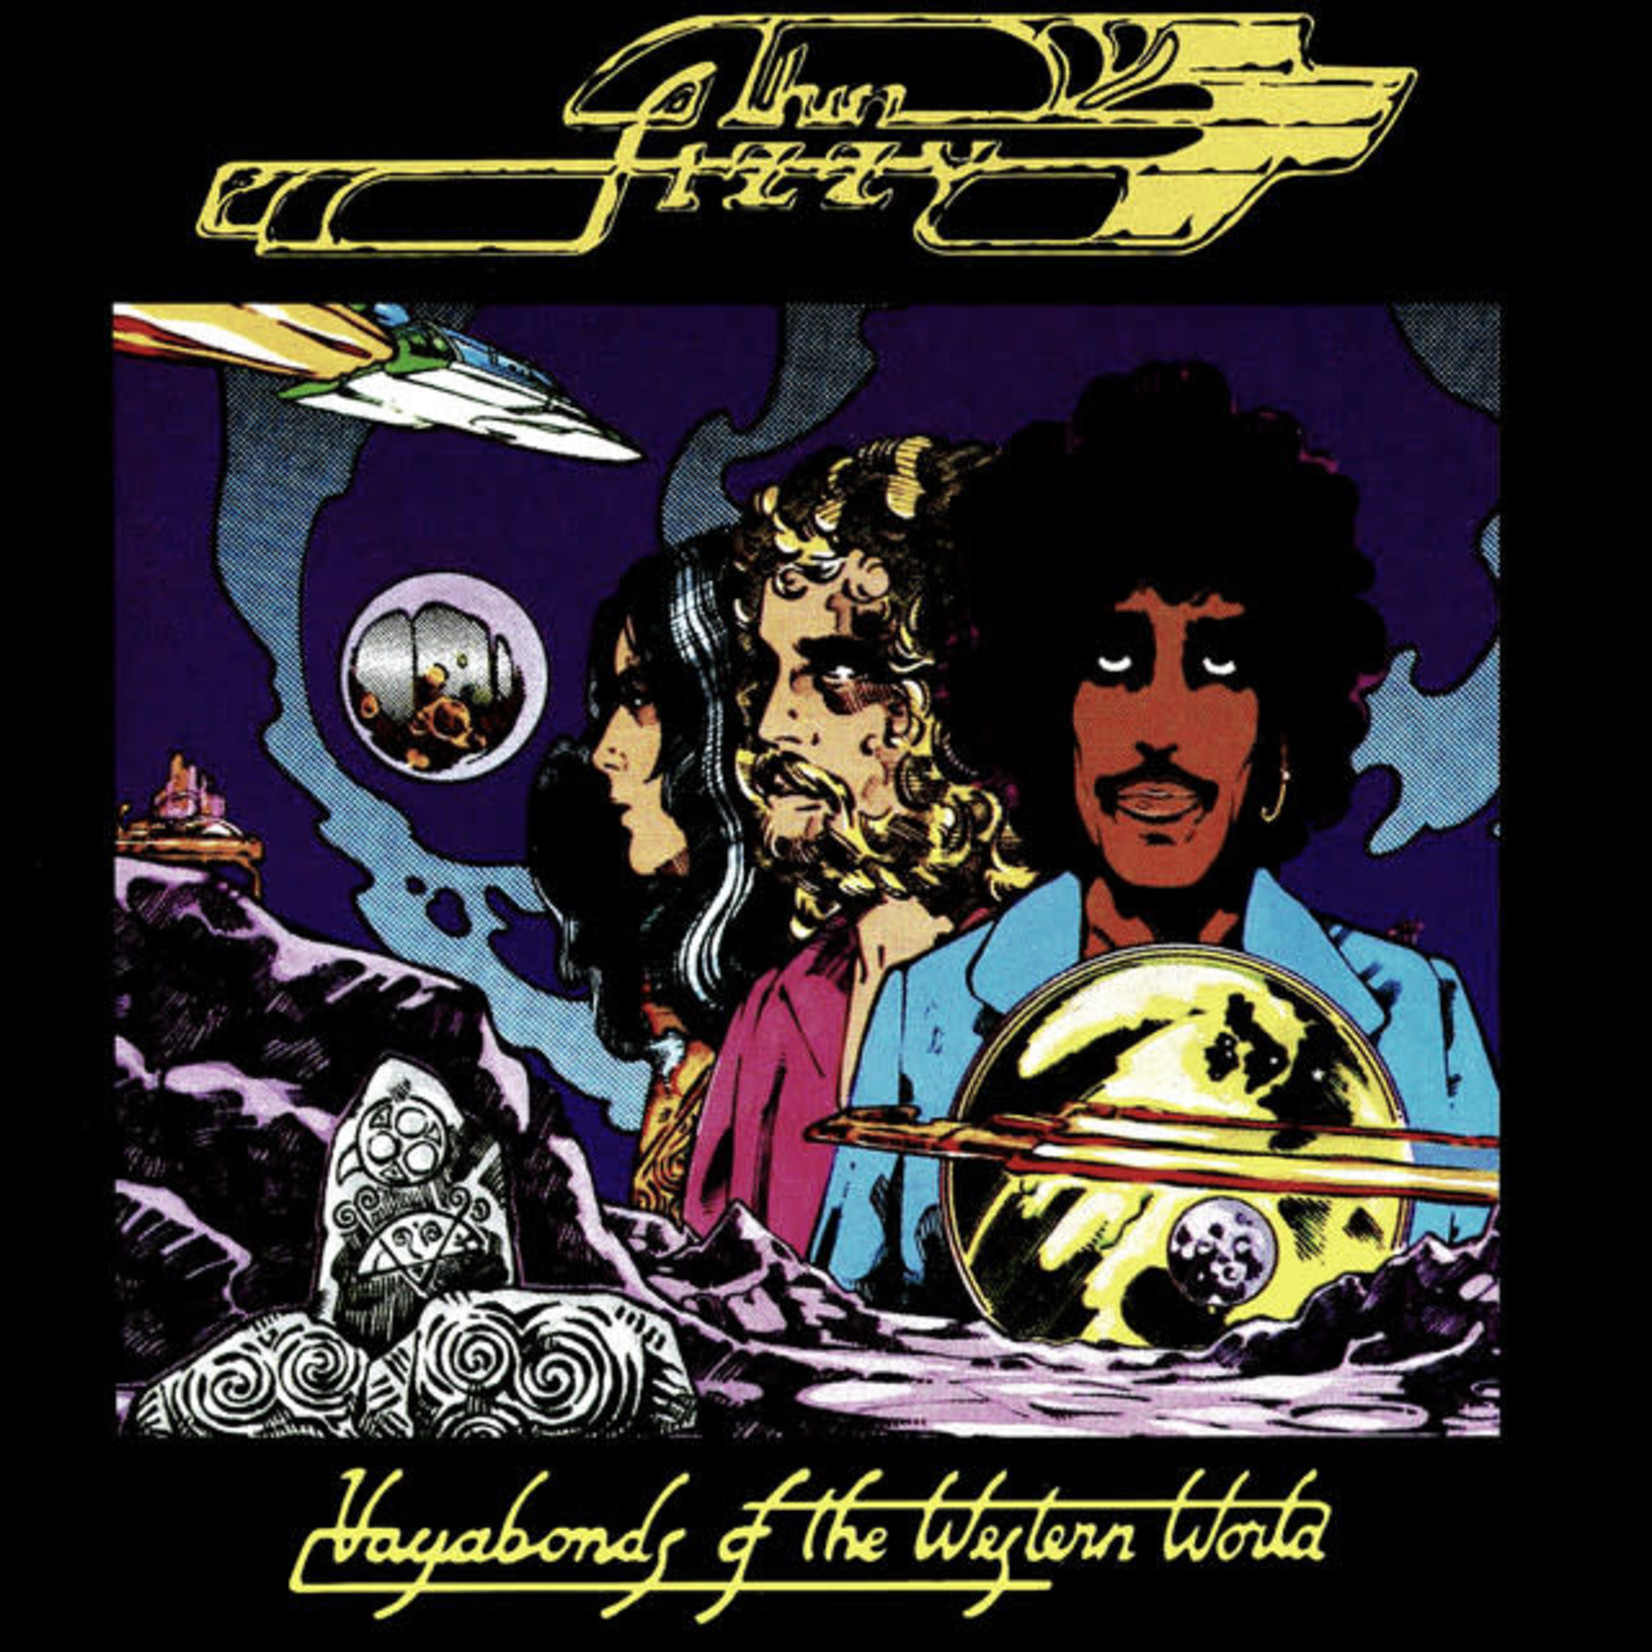 Vinyl Thin Lizzy - Vagabonds Of The World